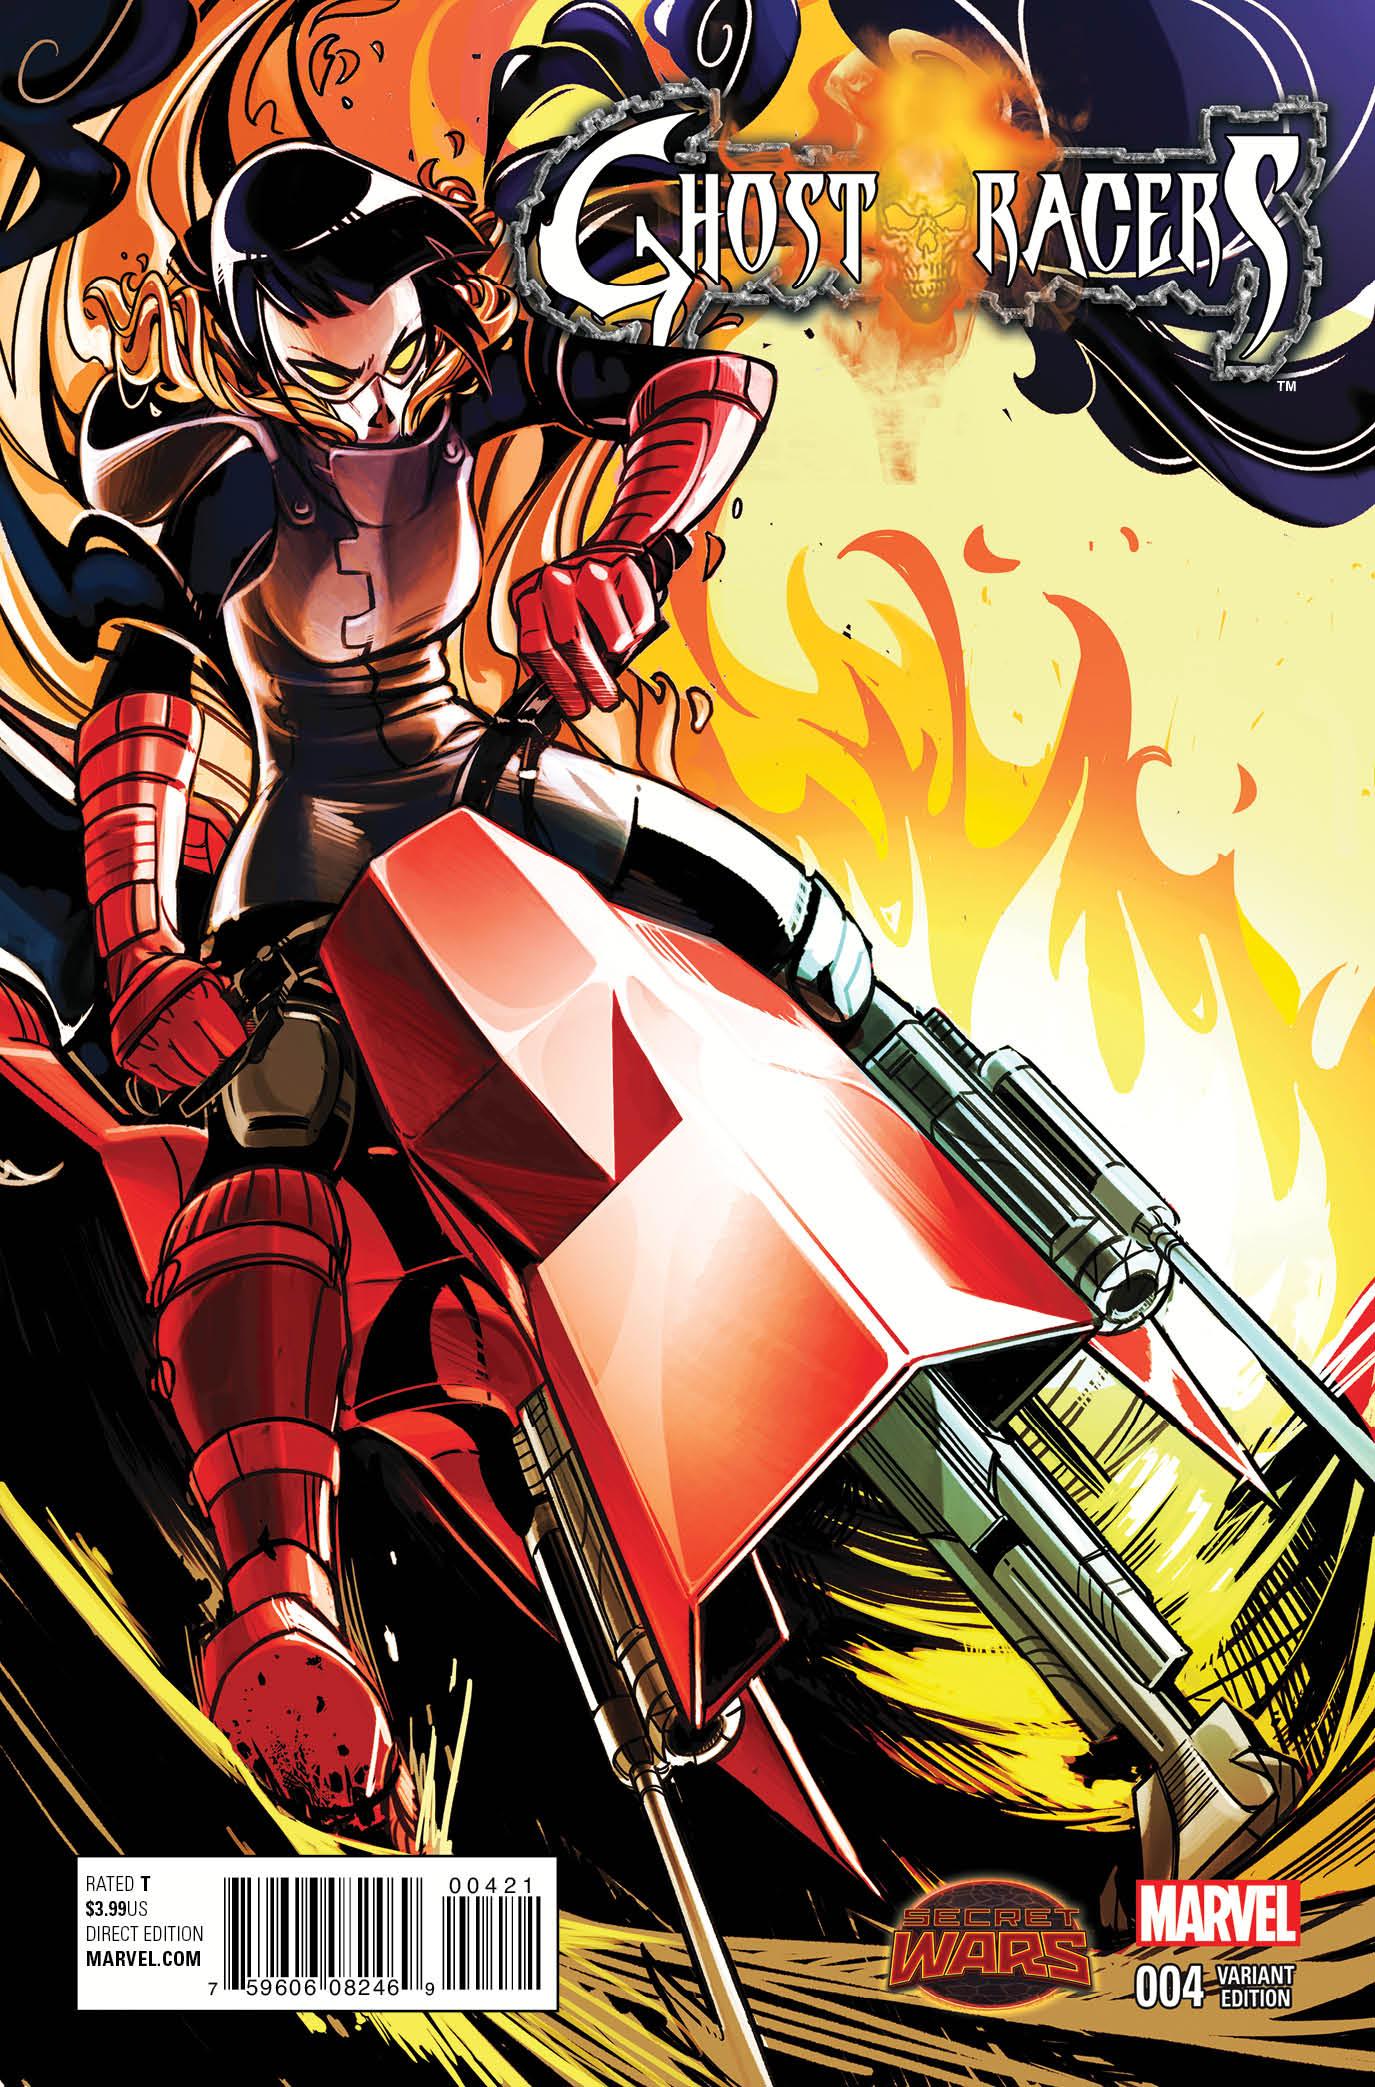 Ghost Racers (2015) #4 (Lee Alejandra Blaze Variant)